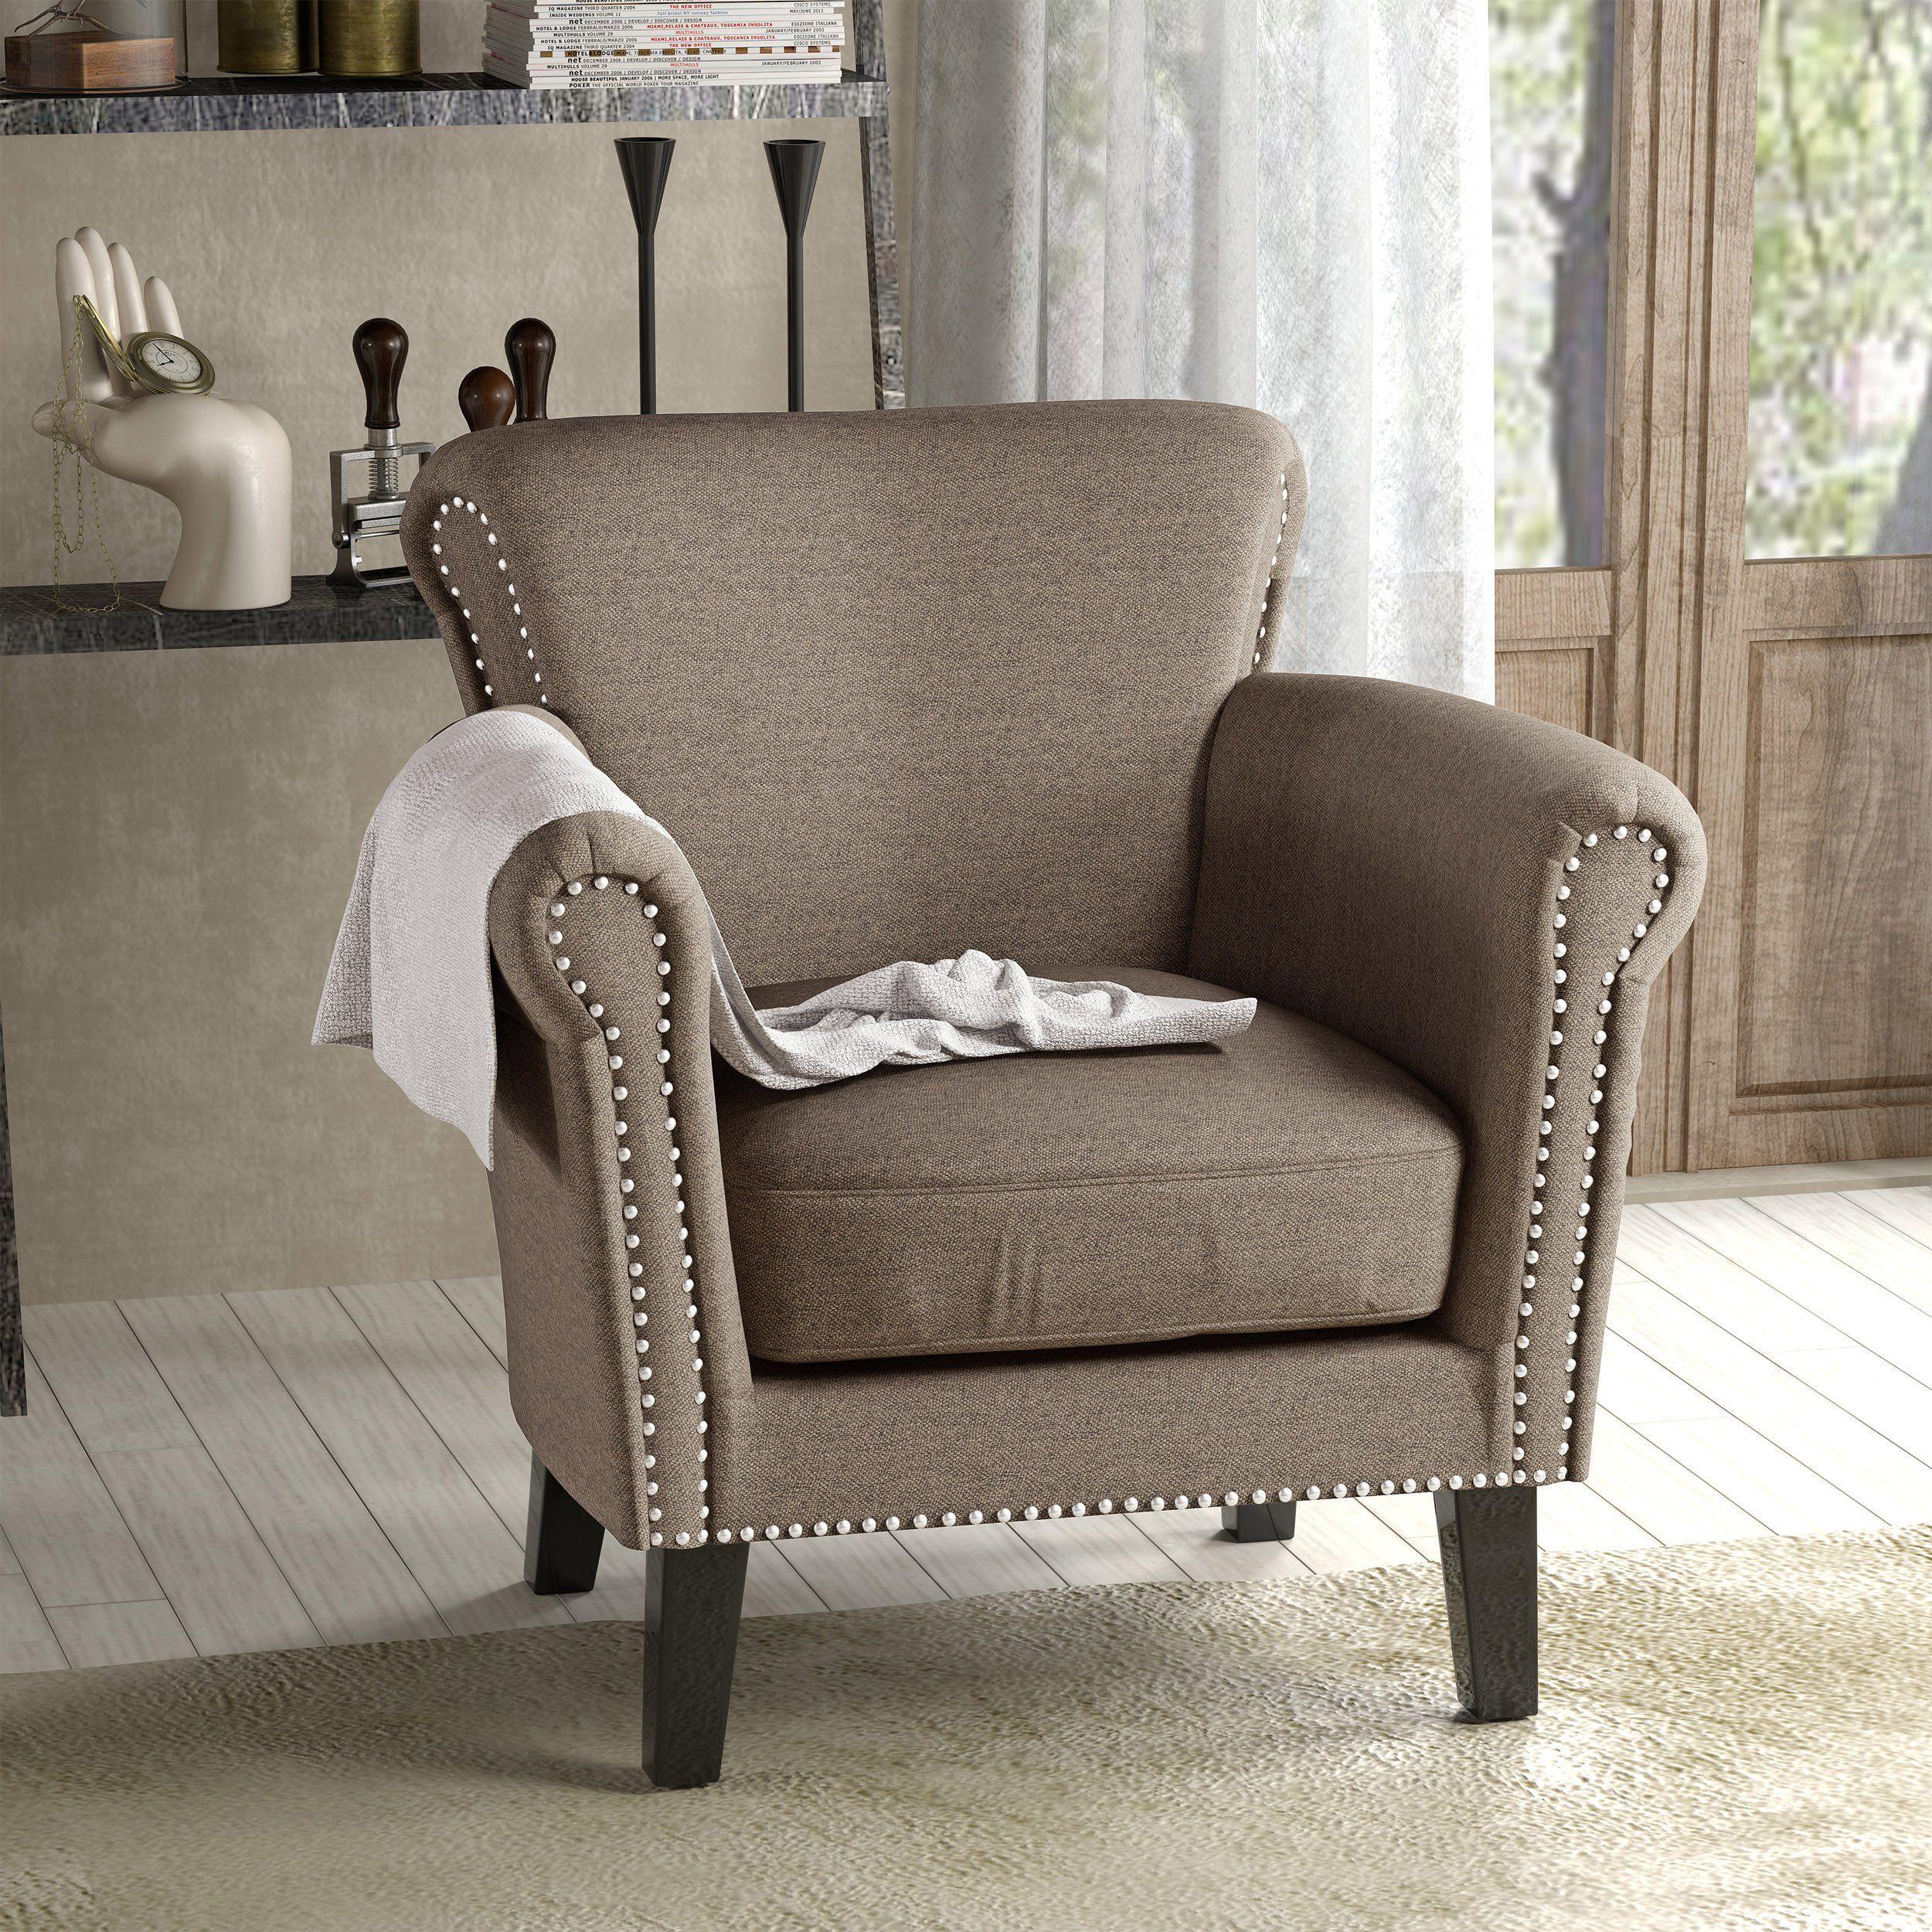 Bly Vintage Scroll Arm Studded Fabric Club Chair